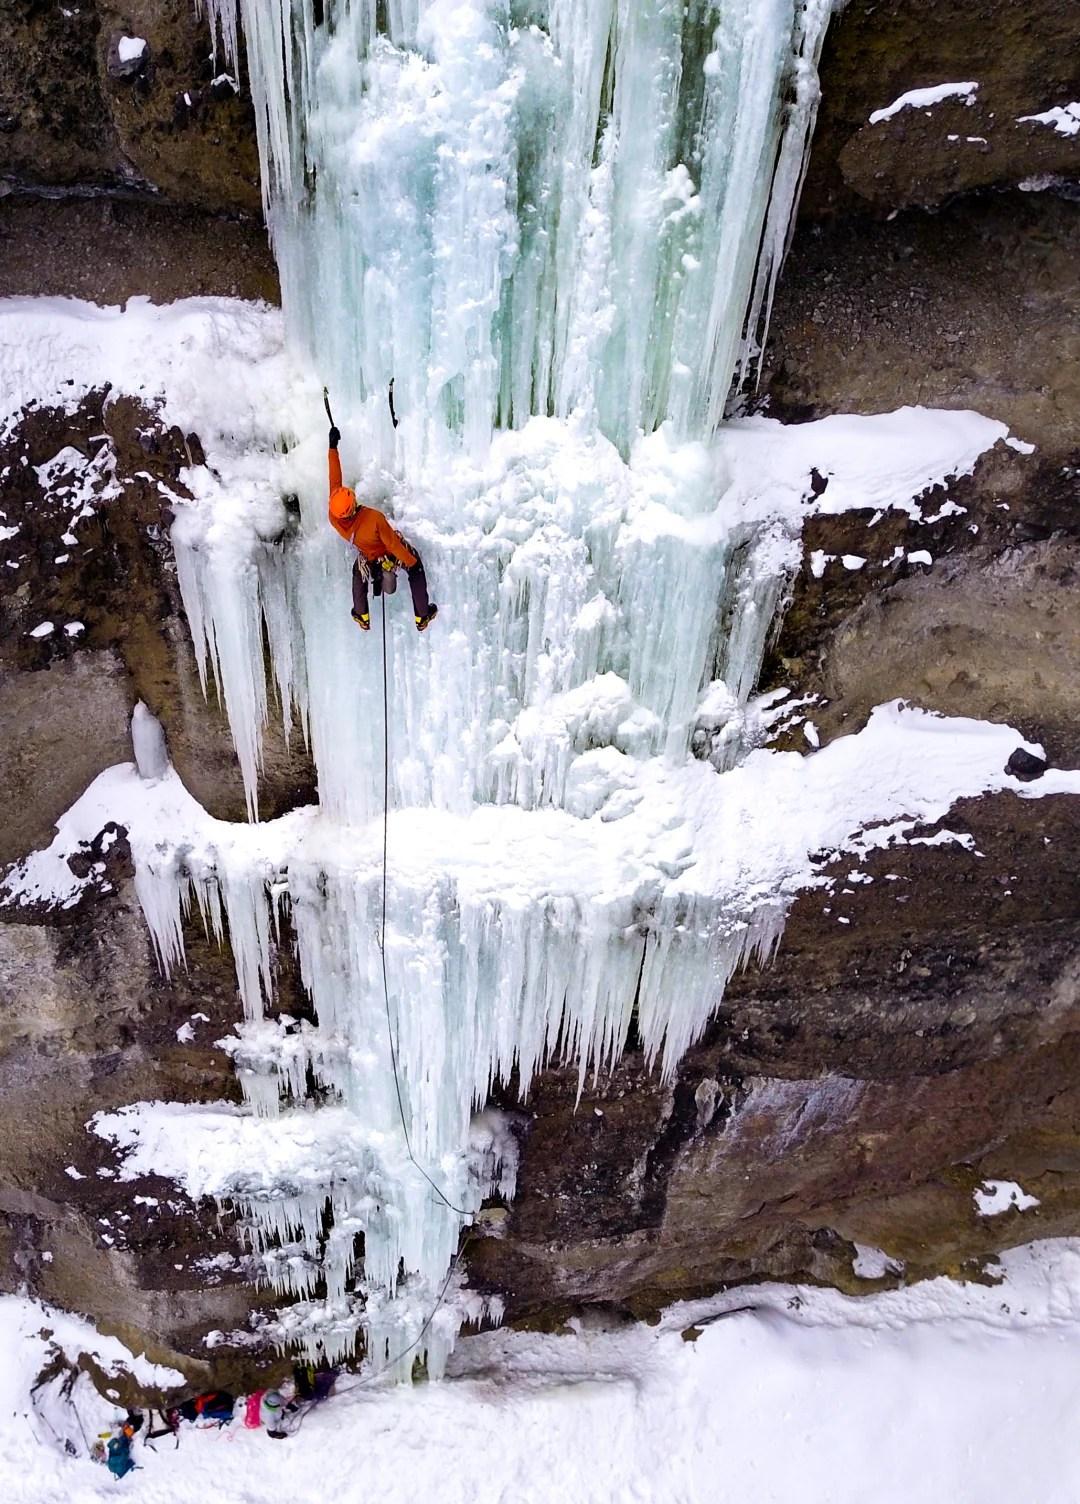 Places near bozeman, mt, usa: Bozeman S Frozen Waterfalls Are A Winter Playground Seattle Met